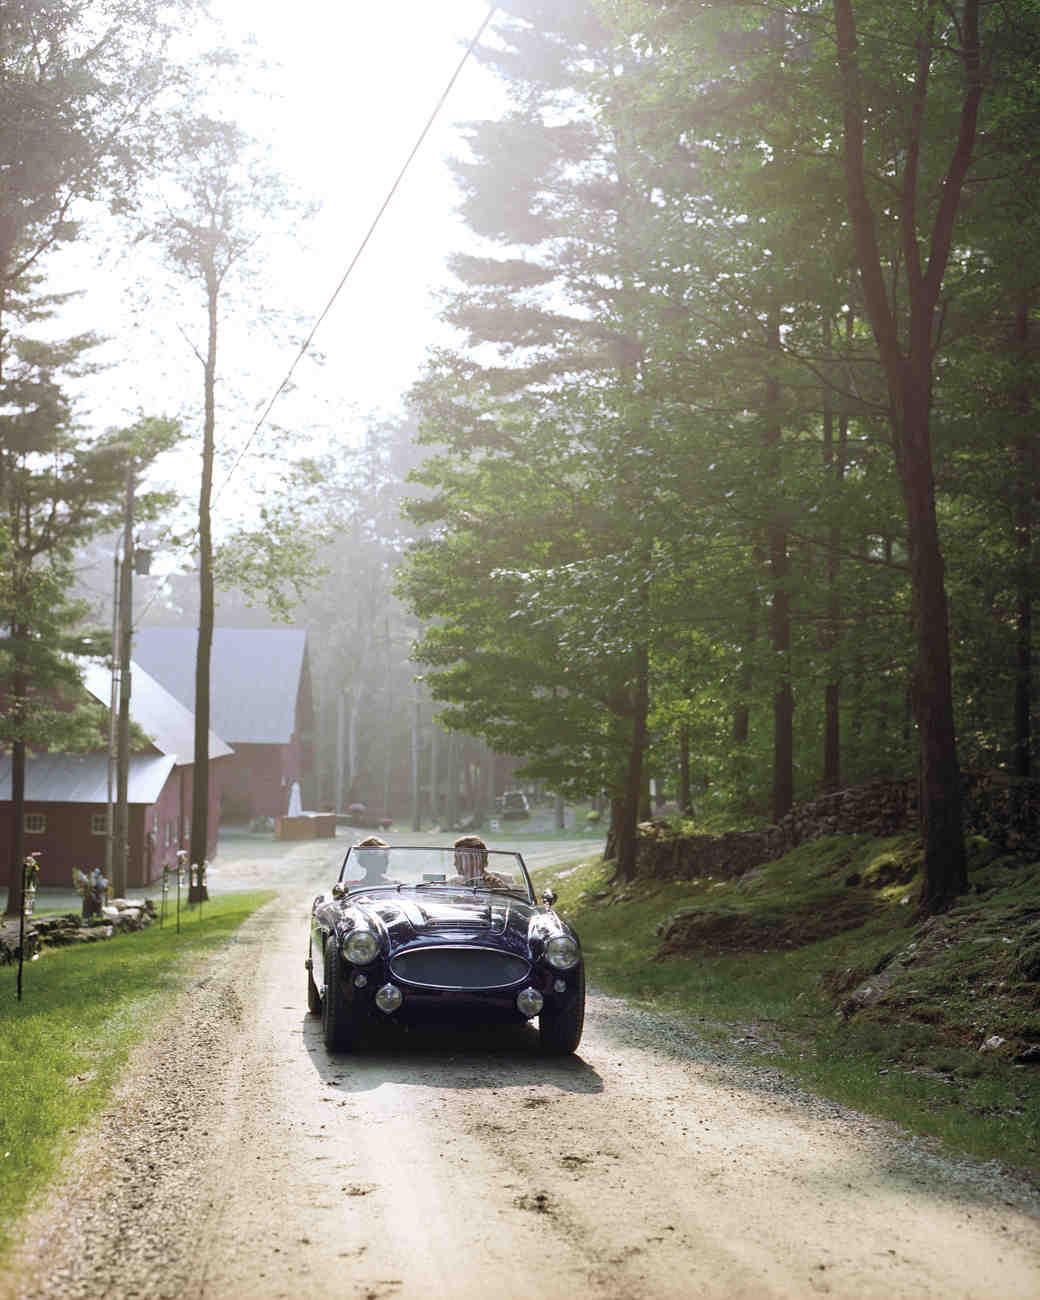 driving-mwd107926.jpg